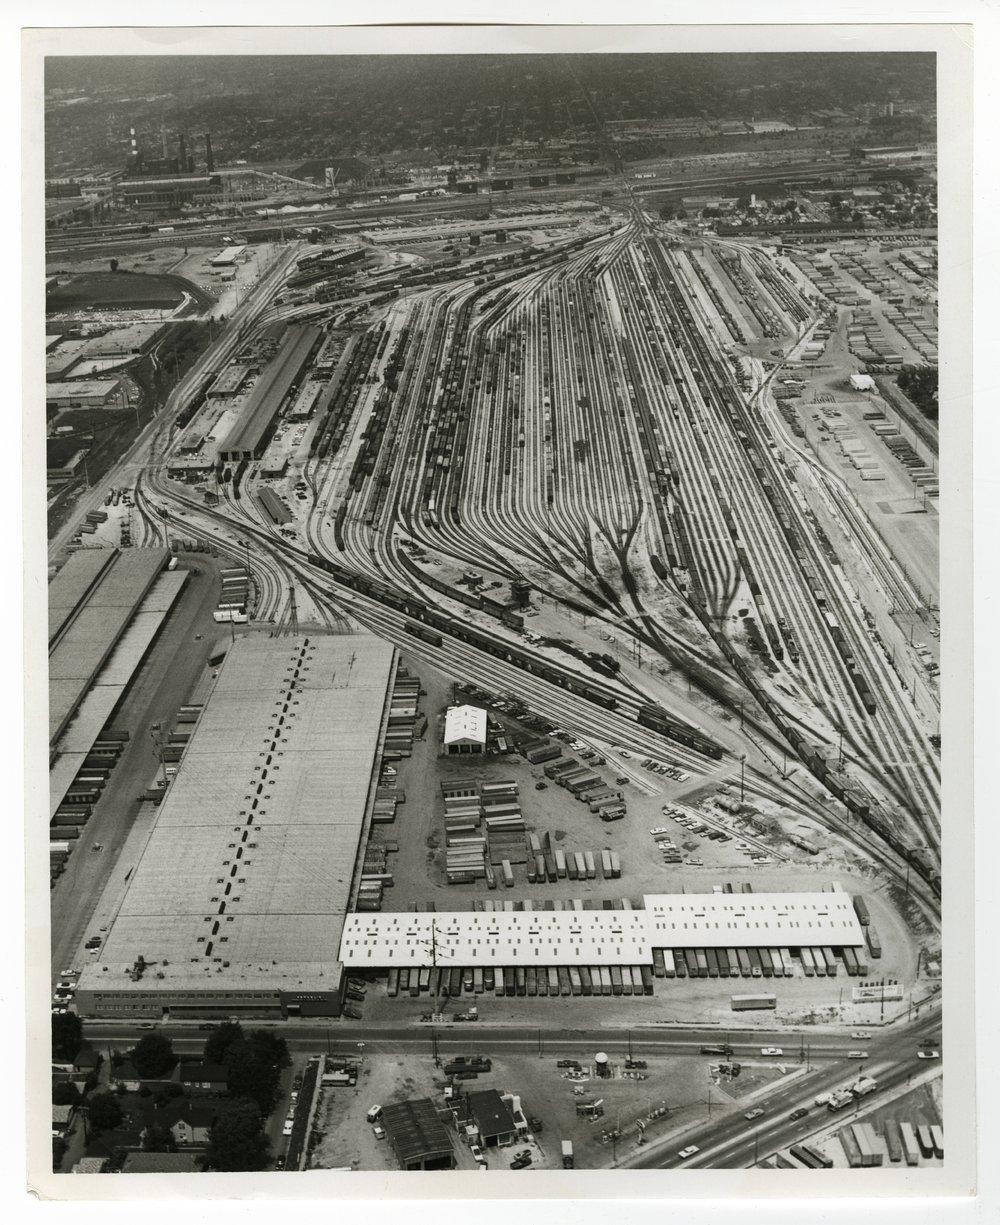 Atchison, Topeka and Santa Fe Railway Company's Corwith Yards, Chicago, Illinois - 1